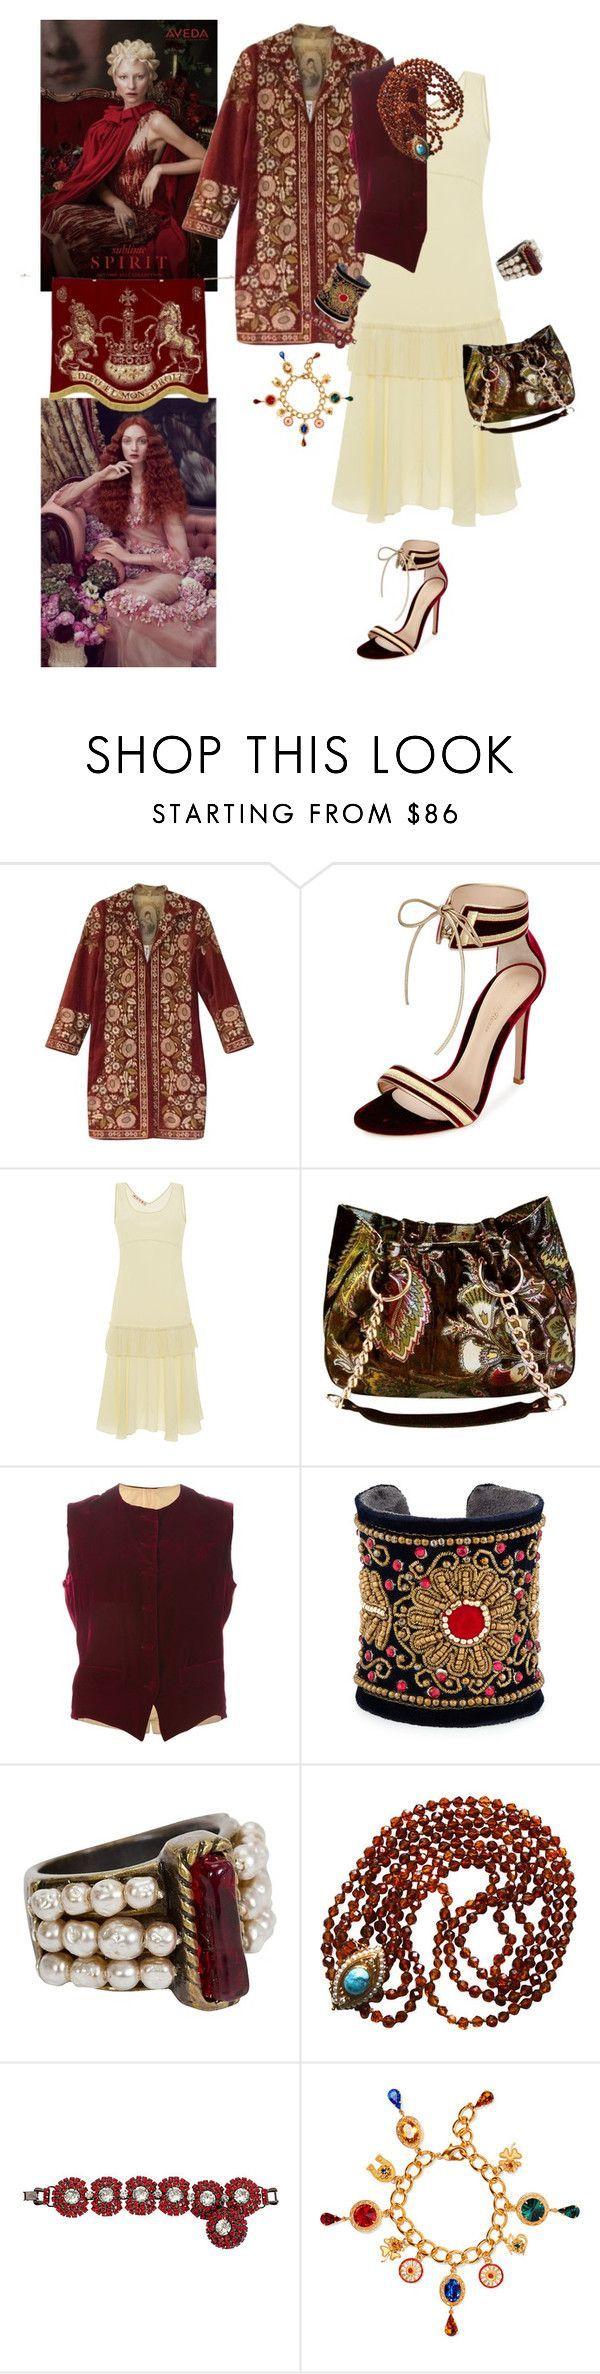 """Royal Velvet"" by taci42 ❤ liked on Polyvore featuring Aveda, Biya, Gianvito Rossi, Oscar de la Renta, Glenda Gies, Jean-Paul Gaultier, Chamak by Priya Kakkar, Chanel and Dolce&Gabbana"